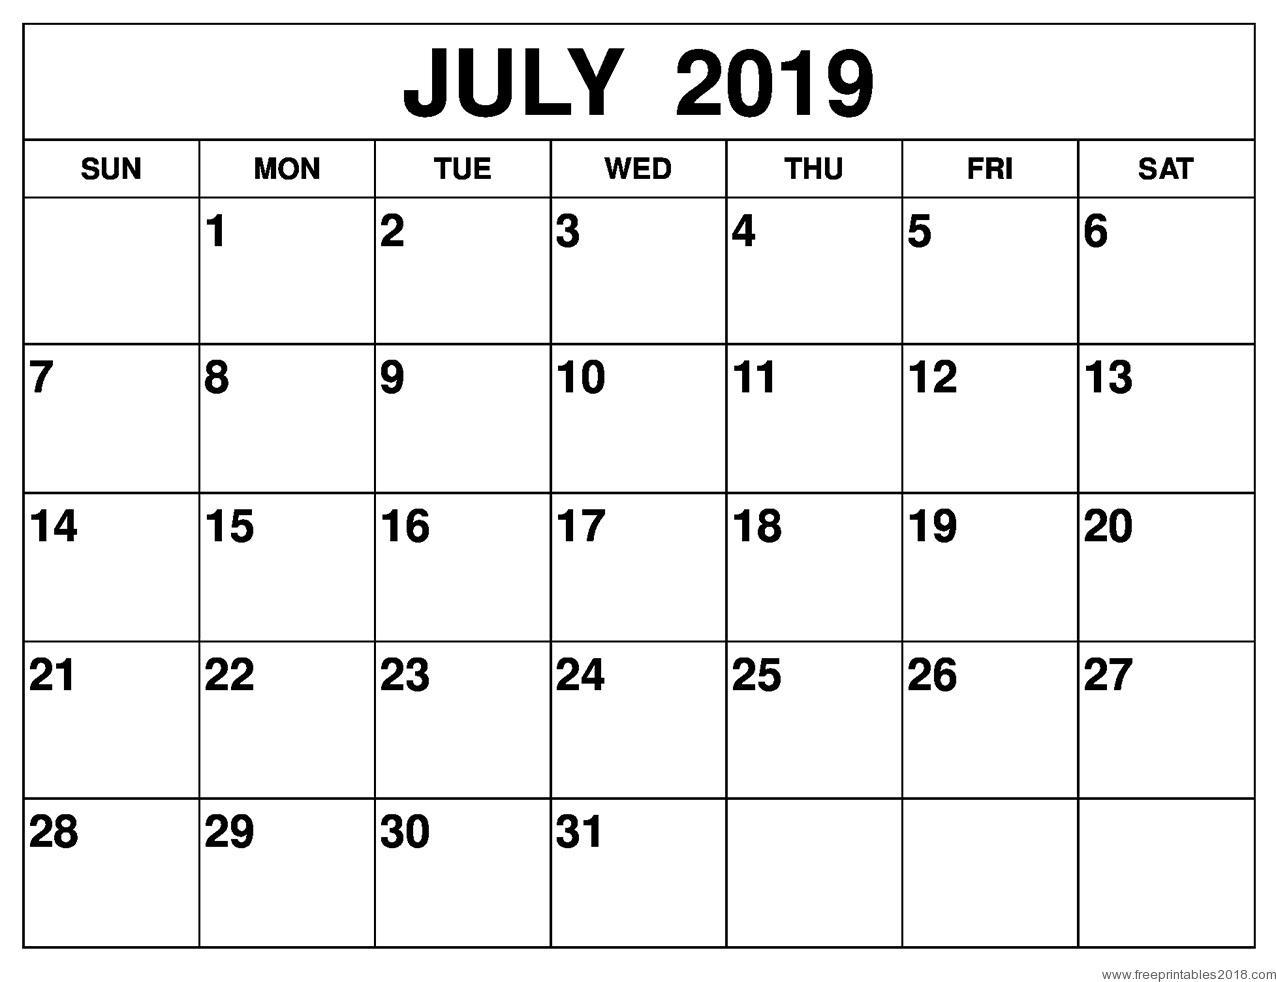 Calendar July 2019 - Free Printable Templates | Free Printables 2019 inside July Calendar Printable Template